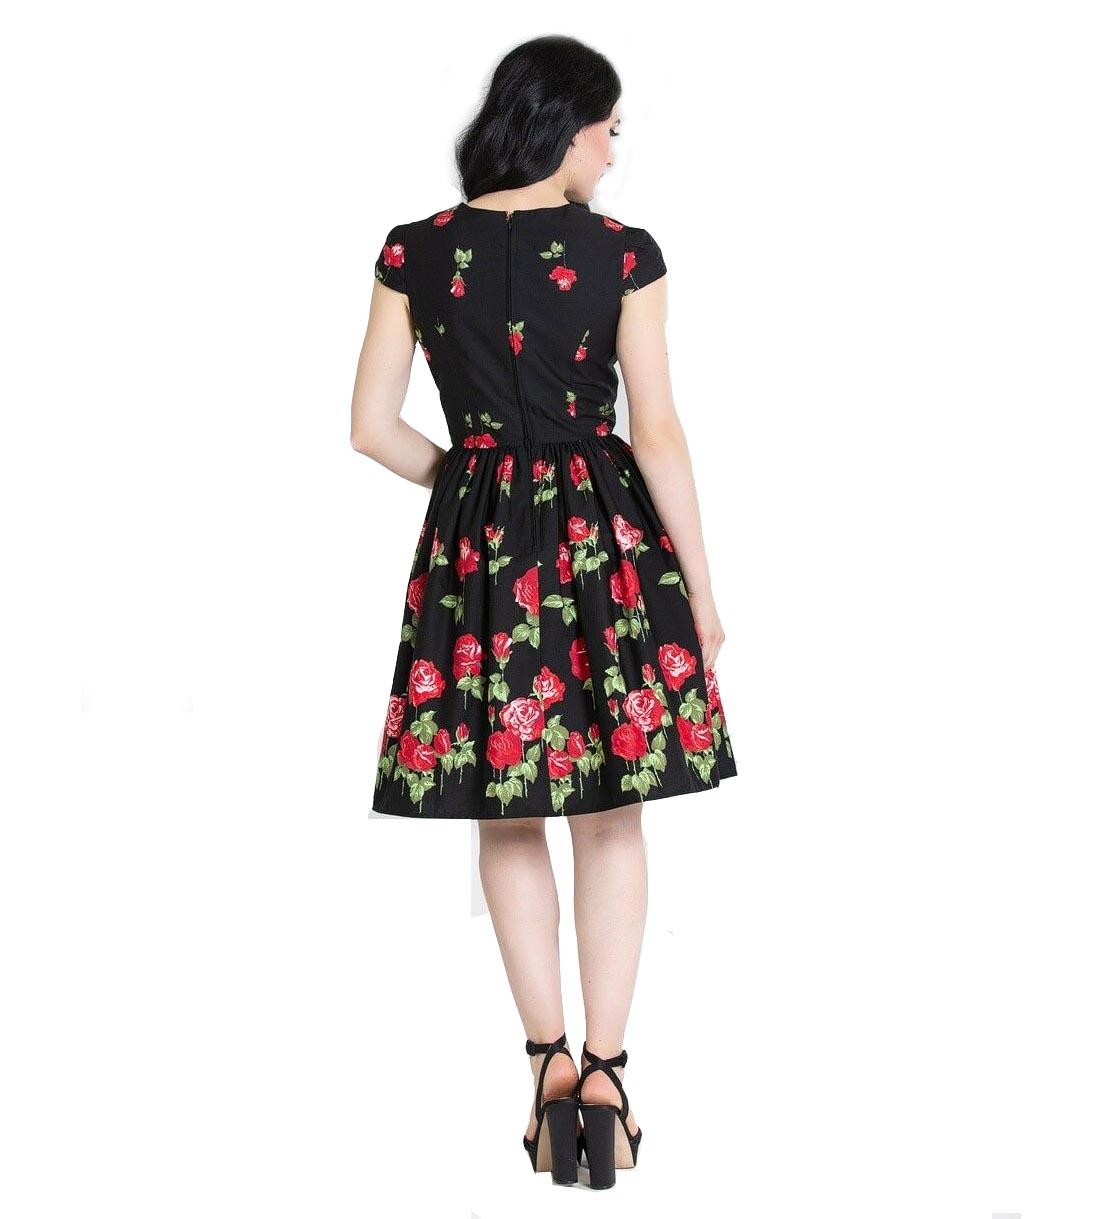 Hell-Bunny-Pin-Up-Mid-Length-50s-Dress-ANTONIA-Rose-Floral-Black thumbnail 13